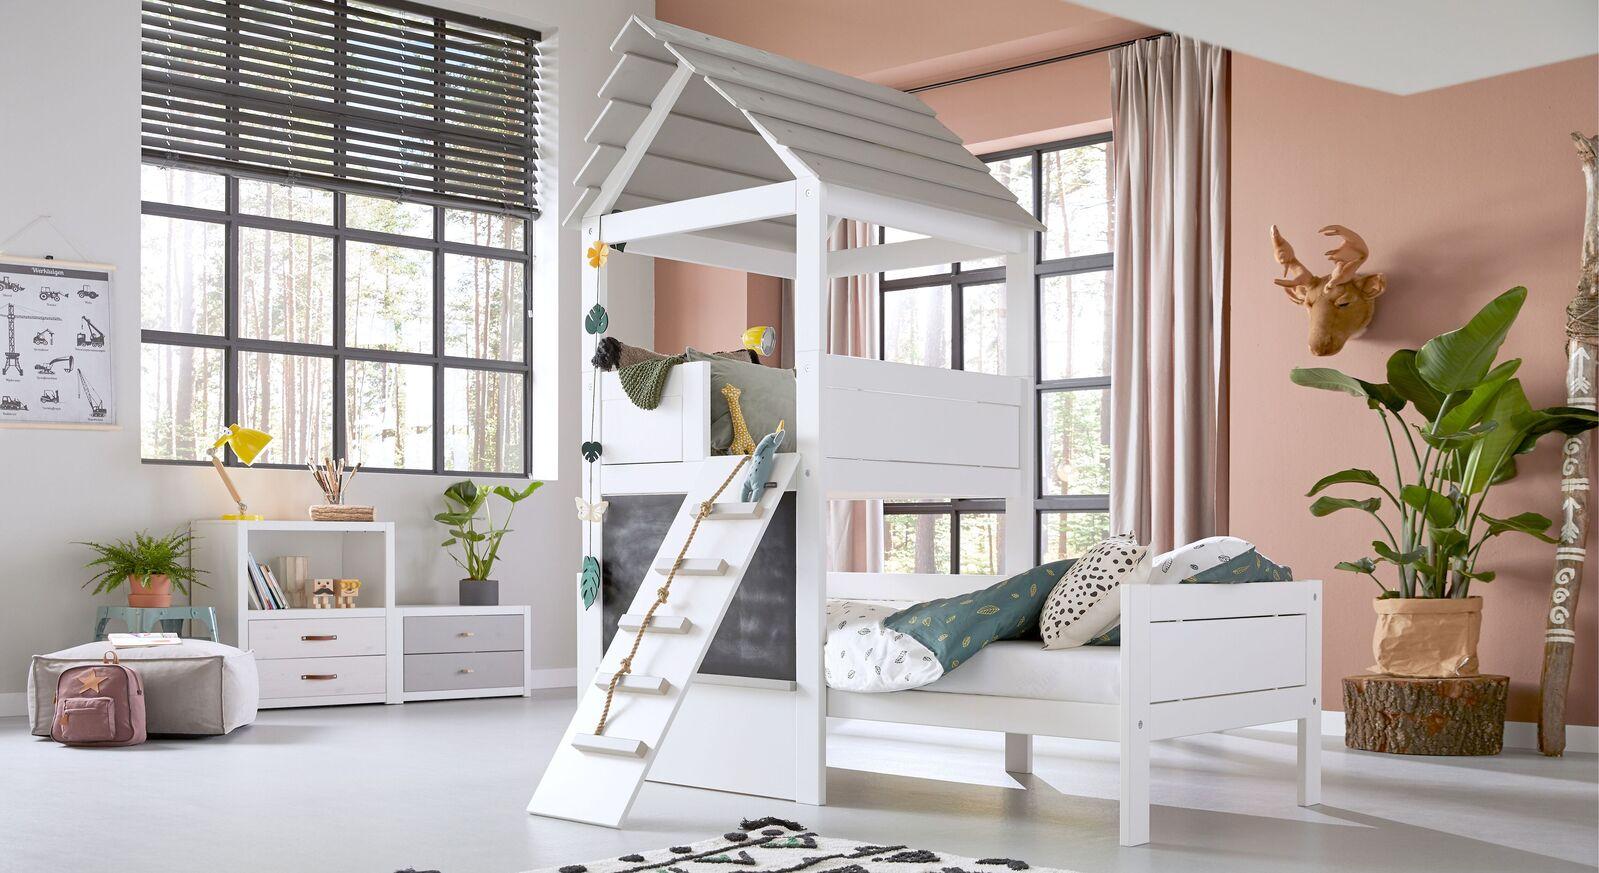 LIFETIME Kinderbett Play Tower als modernes Spielbett